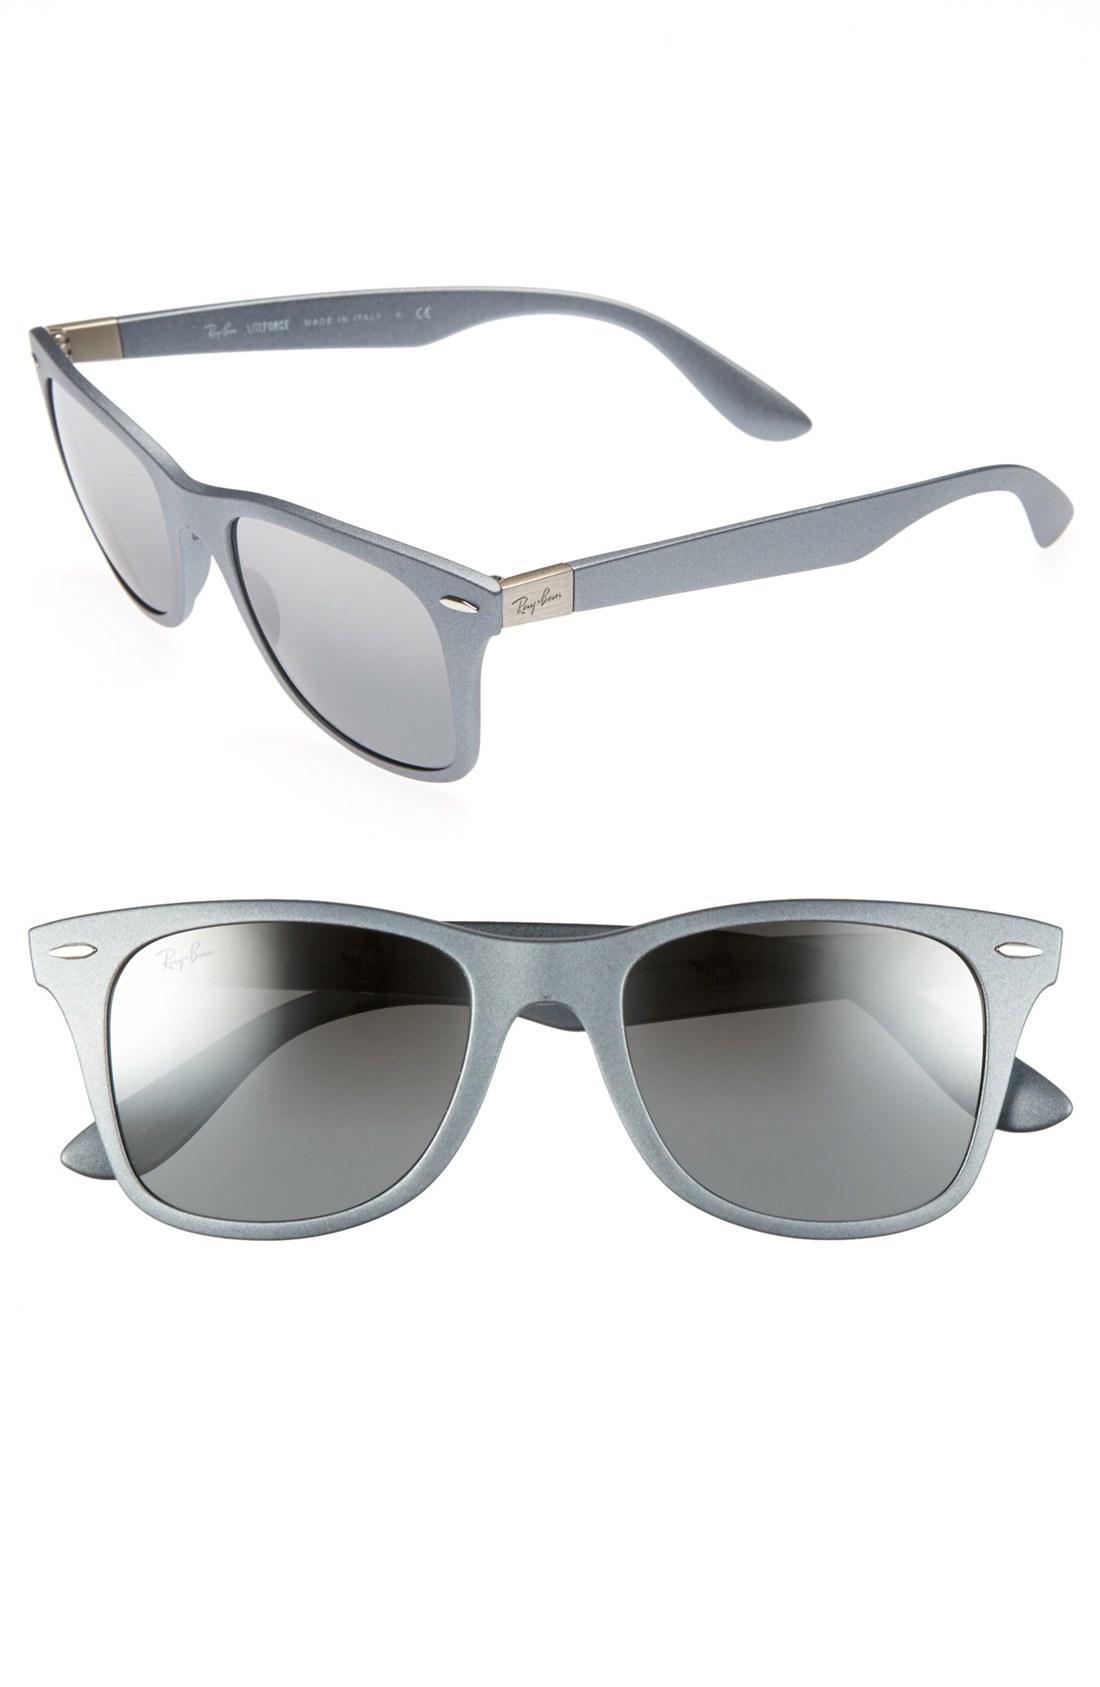 4fa7867591 Lyst - Ray-ban Tech Liteforce Wayfarer Sunglasses in Metallic for Men